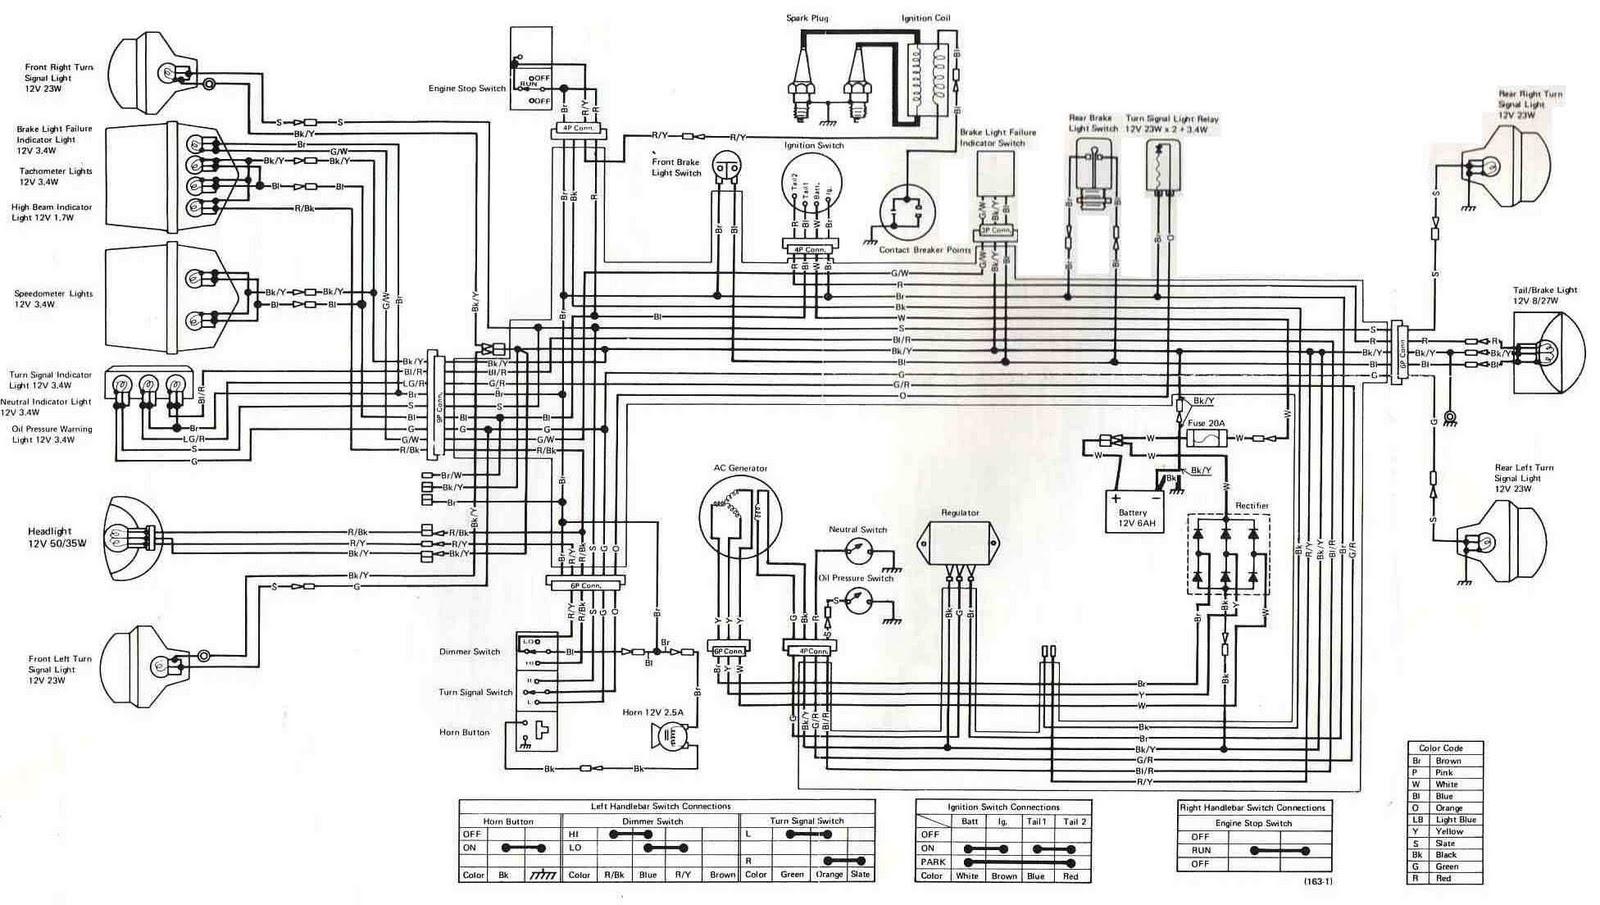 Kawasaki Wiring Schematics Images Reverse Search – Kawasaki 200 Wiring Diagram